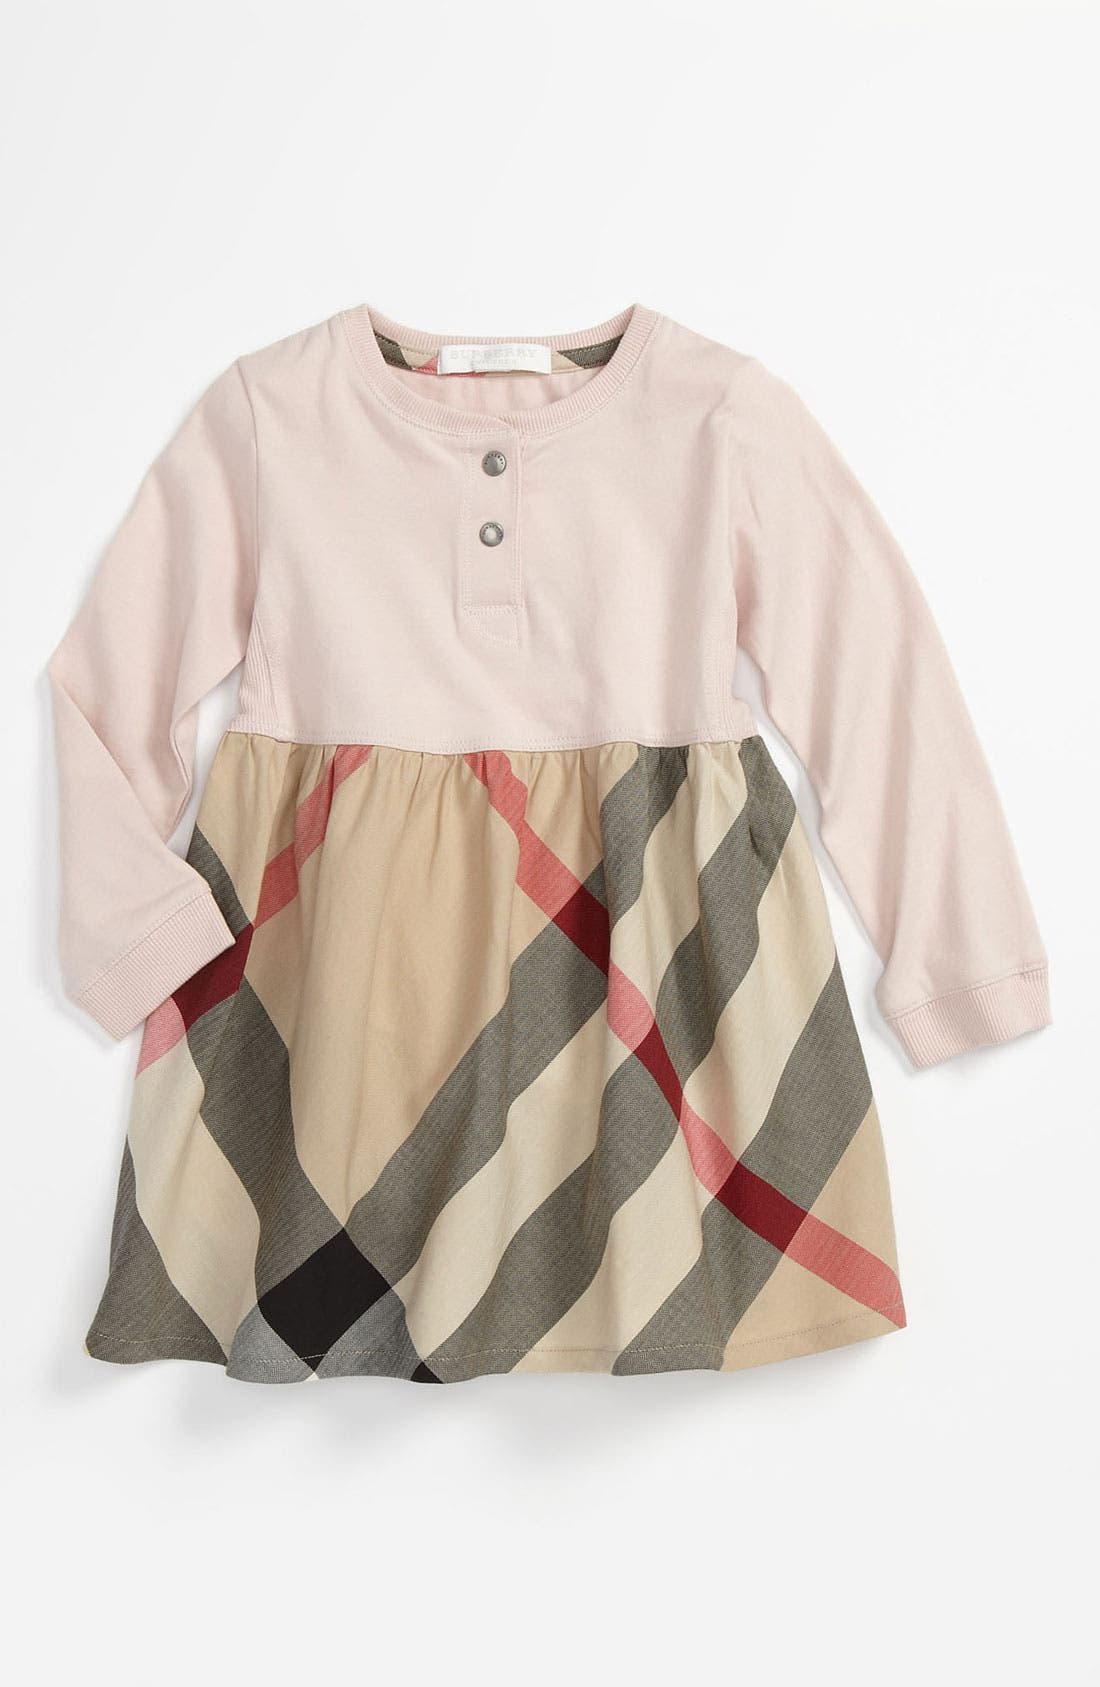 Main Image - Burberry Knit & Woven Dress (Infant)